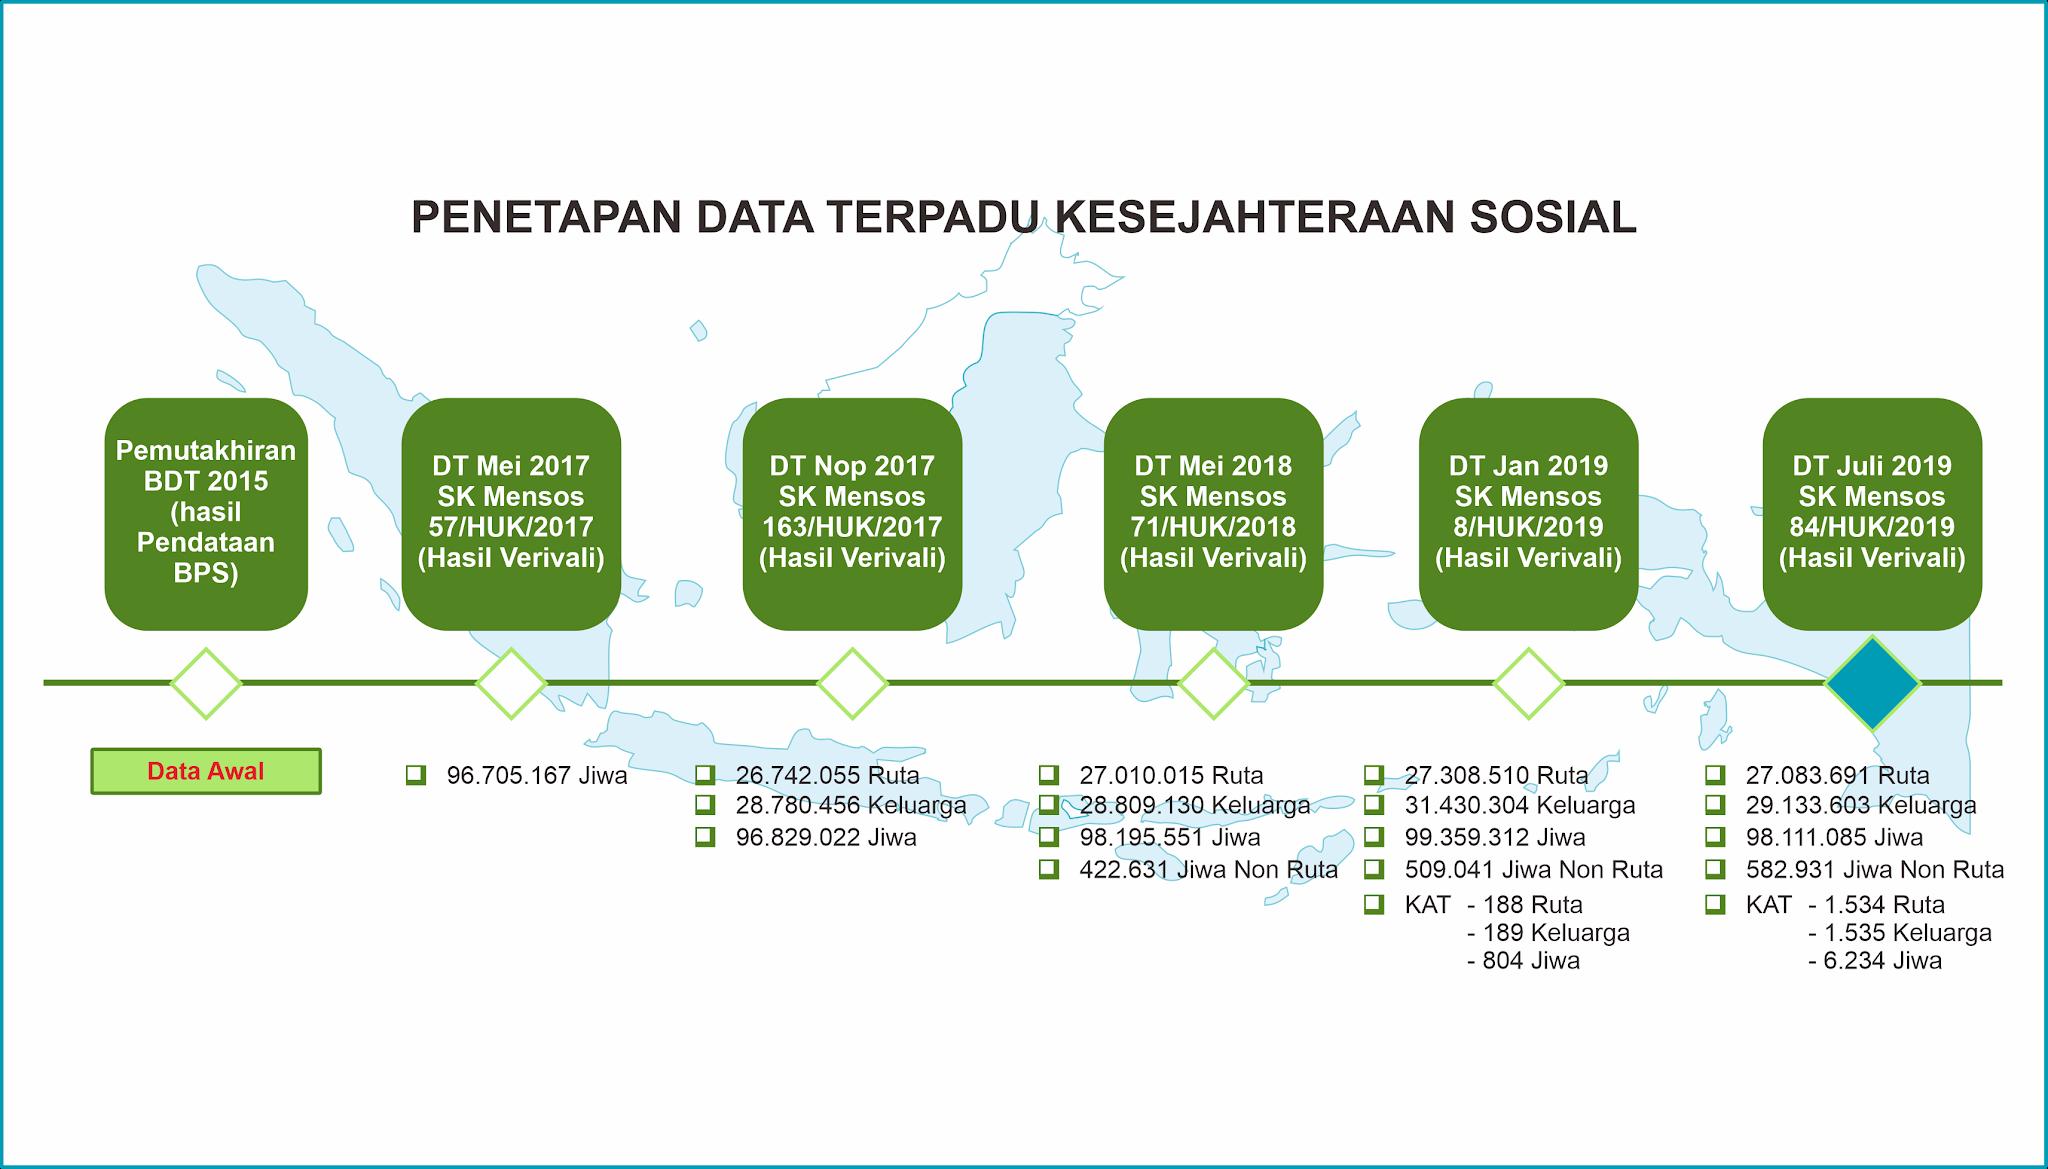 Cek Dtks Data Terpadu Kesejahteraan Sosial Bdt Basis Data Terpadu Kemensos